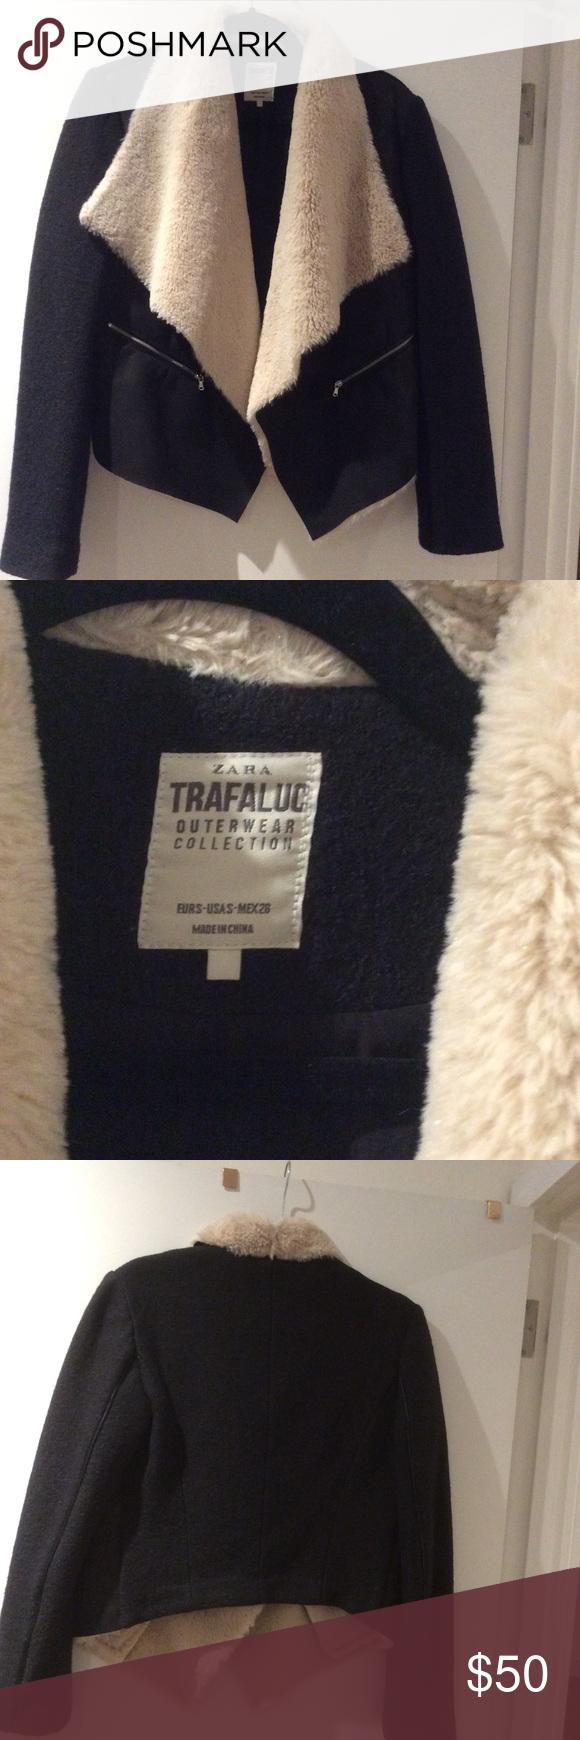 Zara Cropped Trafaluc Outerwear Collection Jacket Zara Clothes Design Trafaluc [ 1740 x 580 Pixel ]